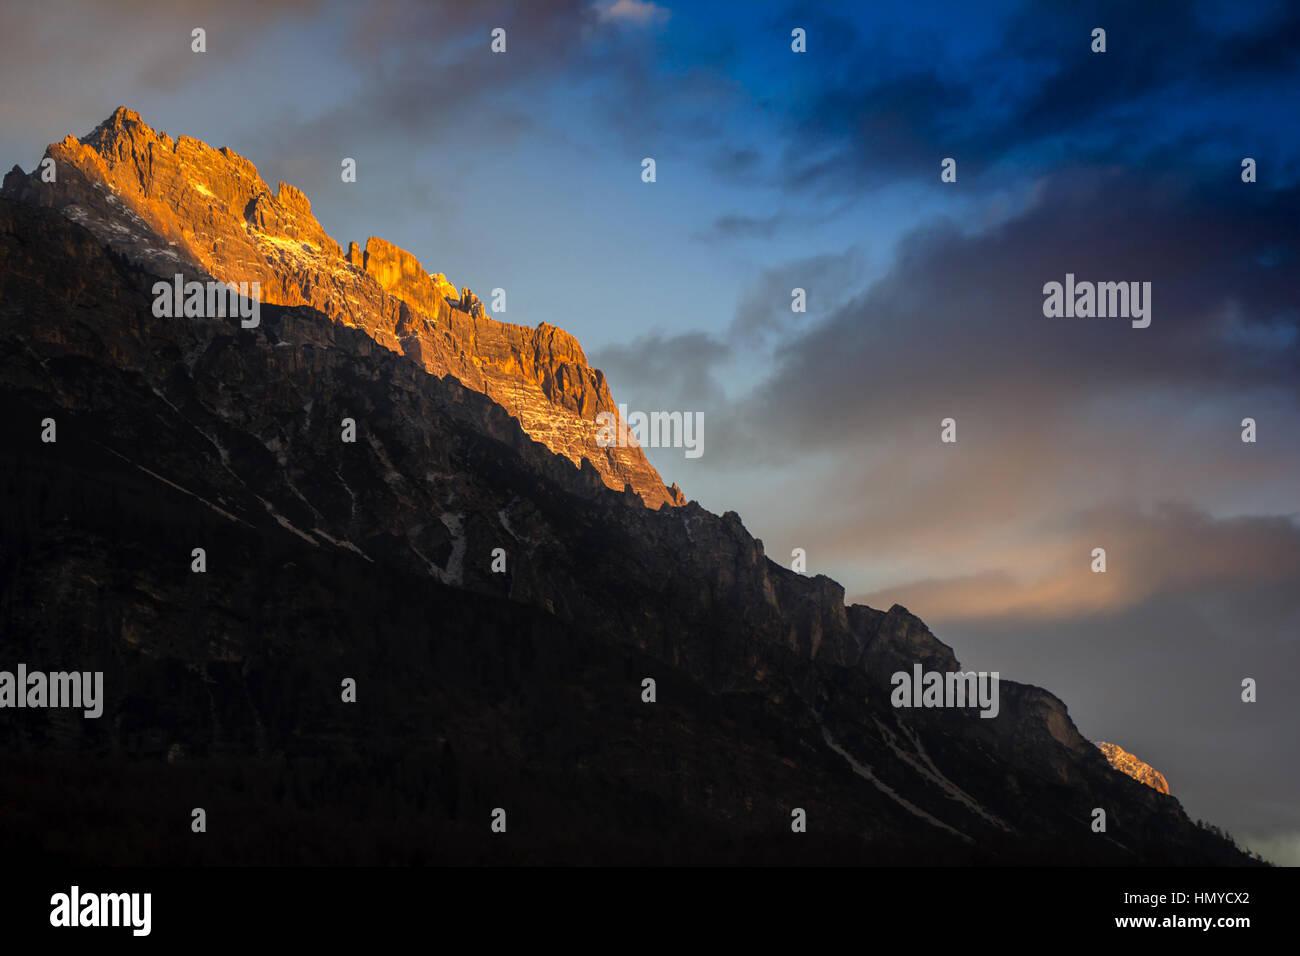 Sunset in Dolomites, mountains around Famous ski resort Cortina D Ampezzo - Stock Image